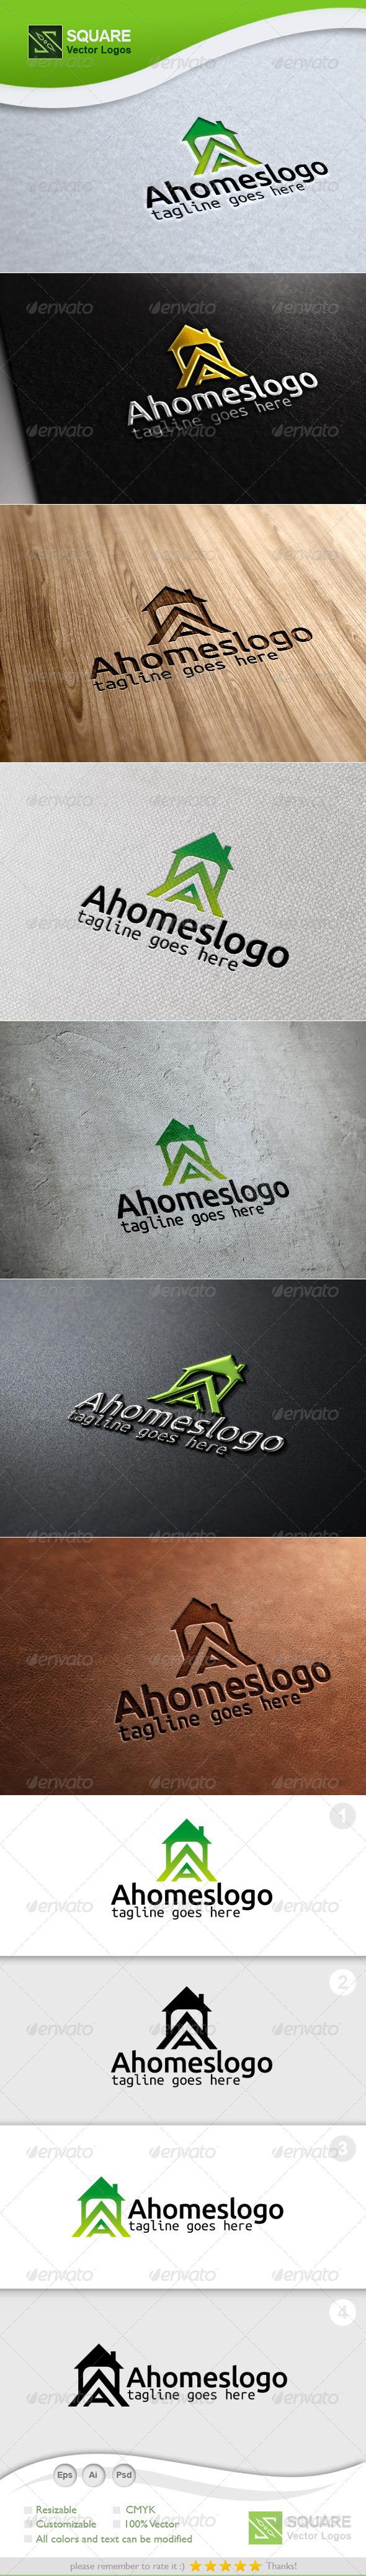 GraphicRiver A House Vector Logo Template 6704184